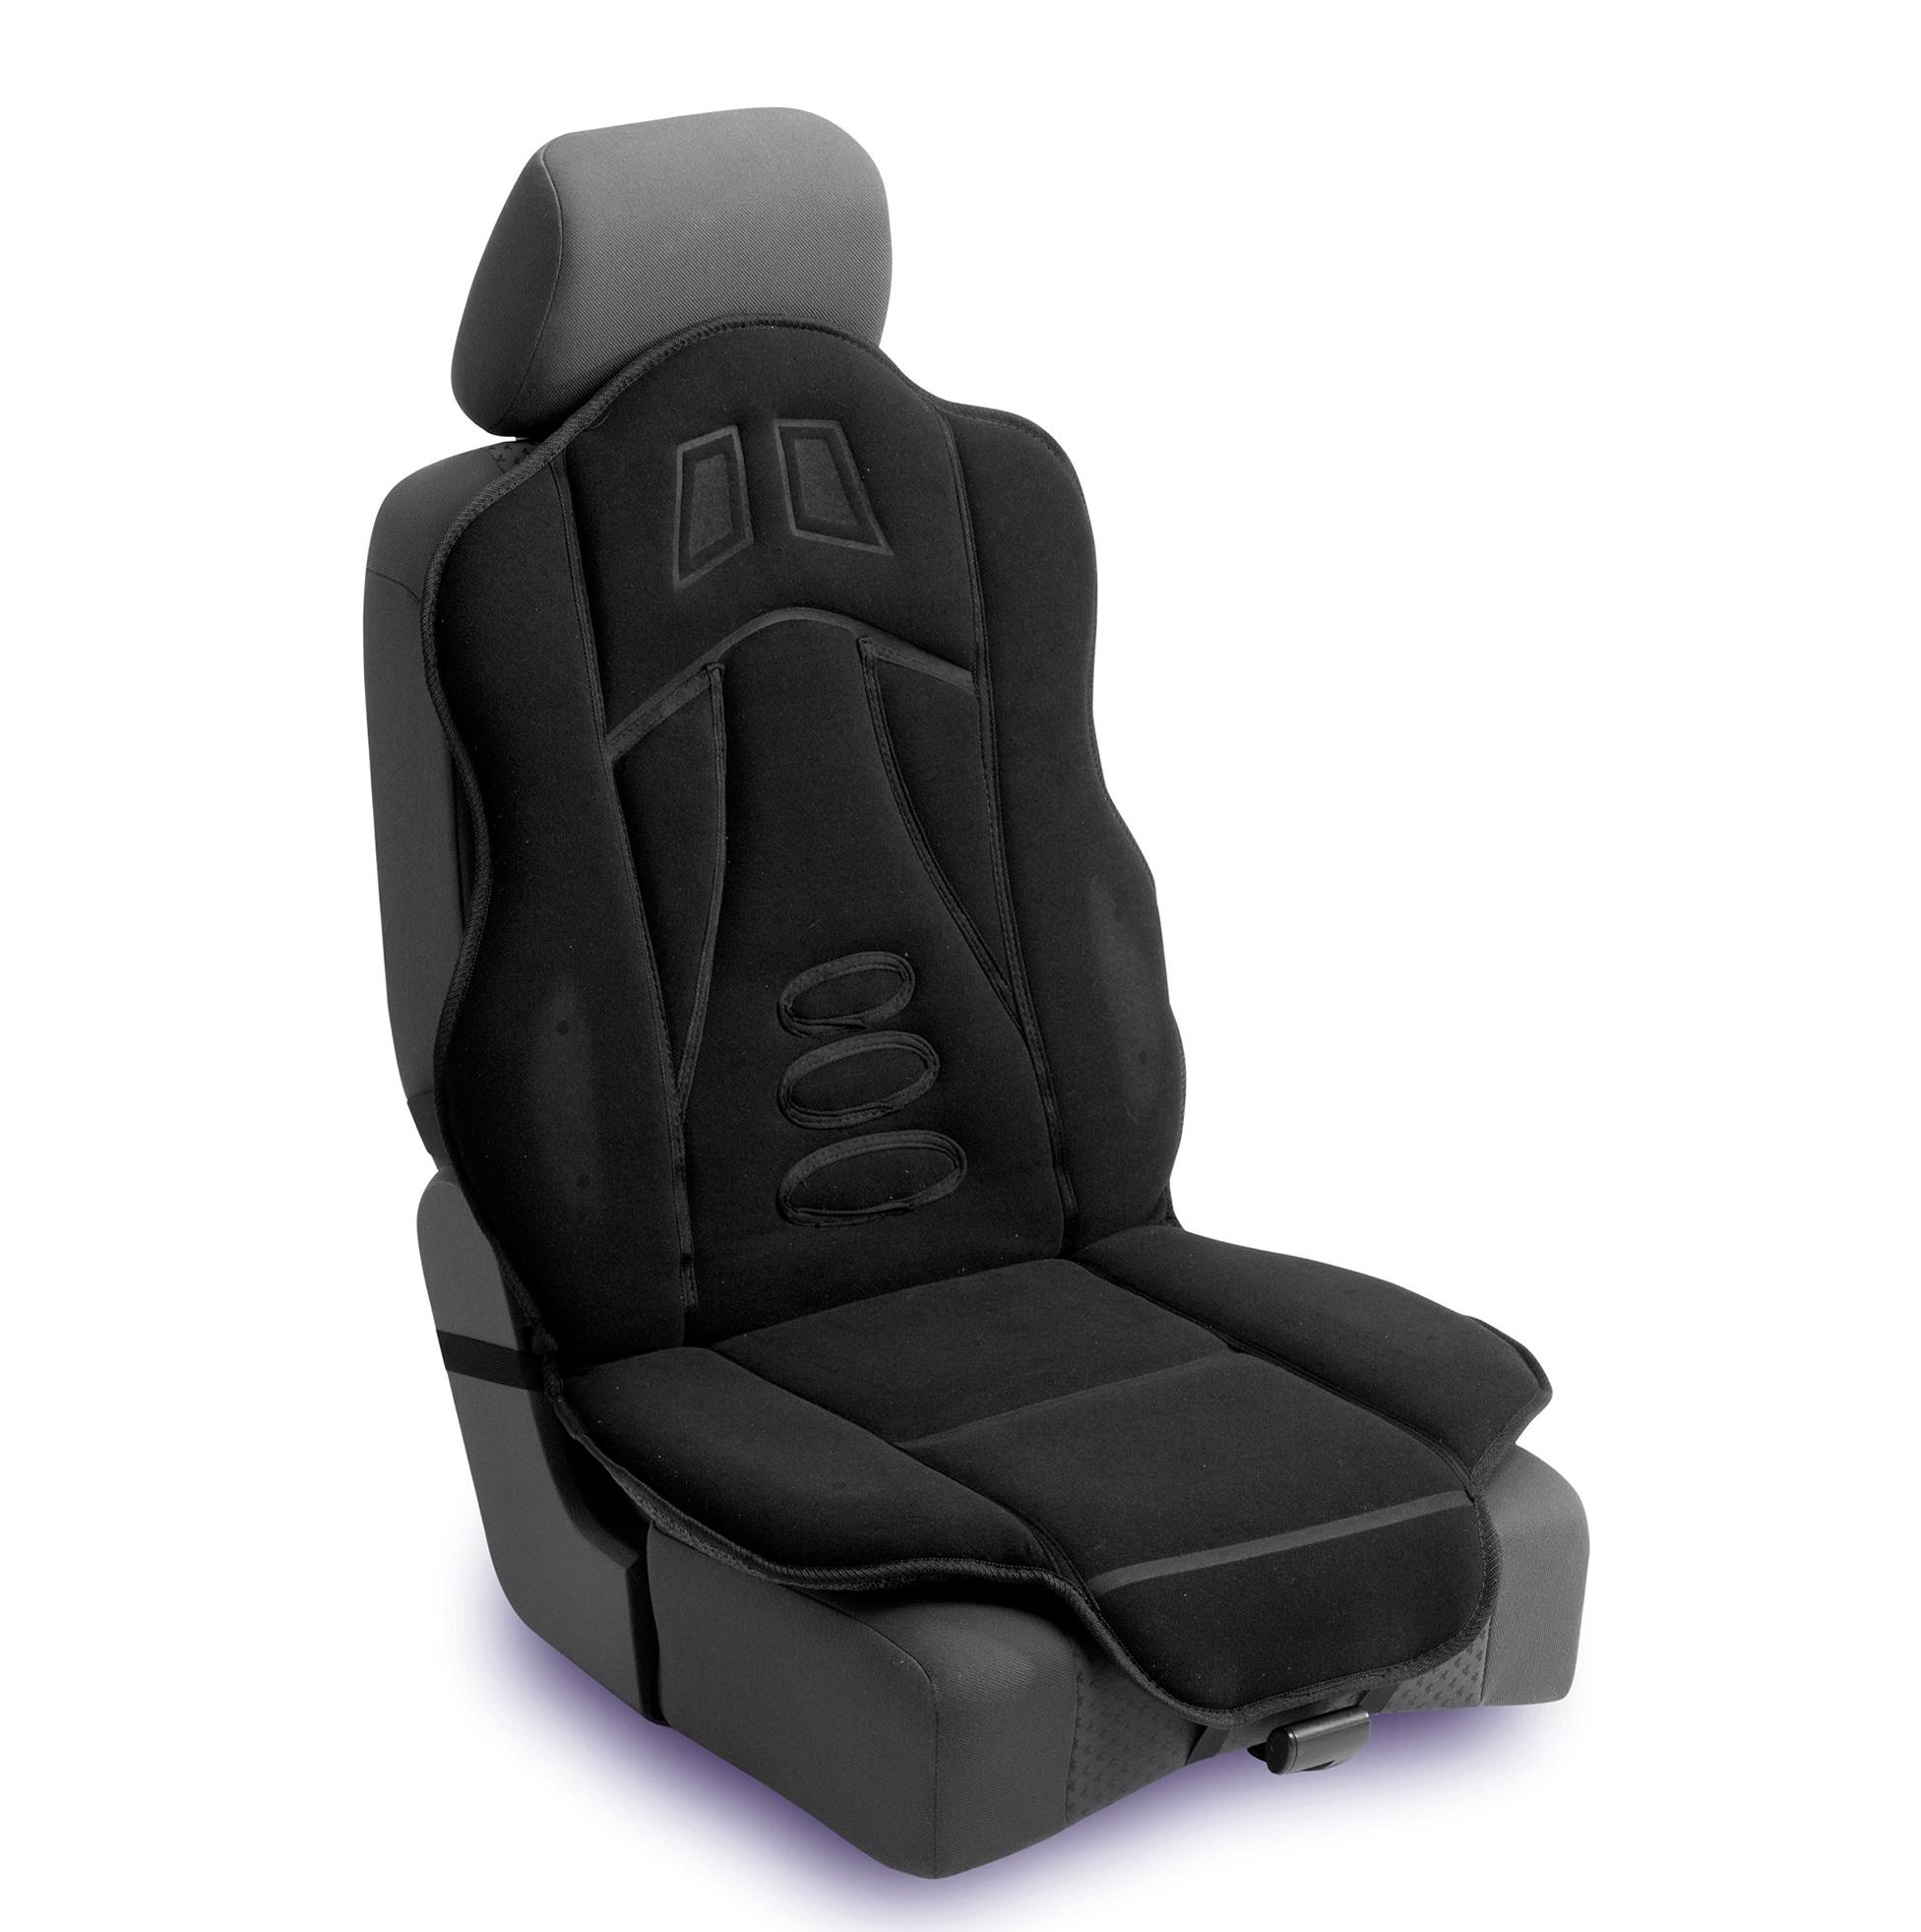 car seat cushions for short drivers home design ideas. Black Bedroom Furniture Sets. Home Design Ideas